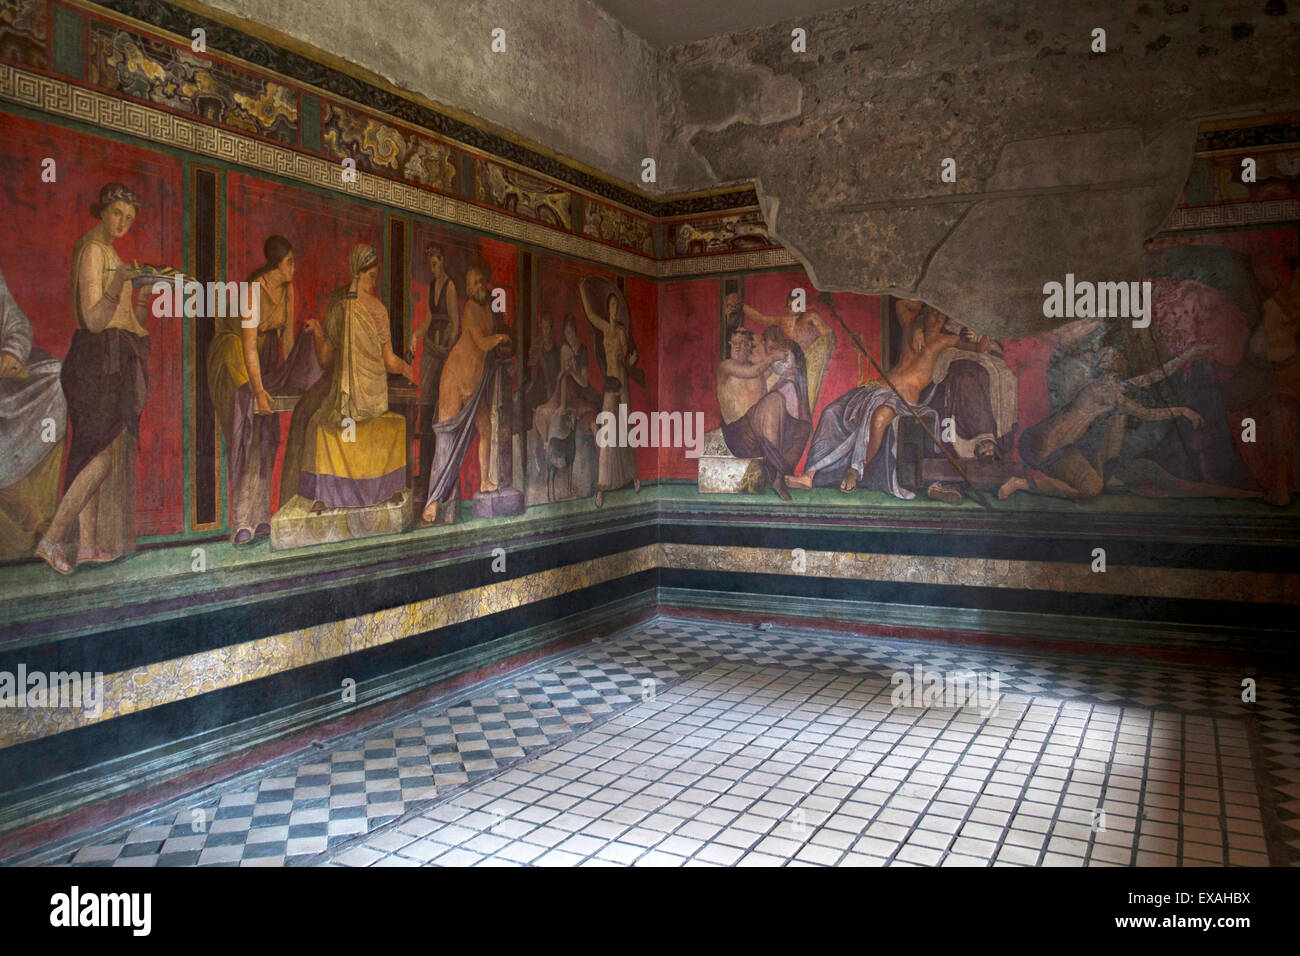 Triclinium frescoes, Villa dei Misteri, Pompeii, UNESCO World Heritage Site, Campania, Italy, Europe - Stock Image